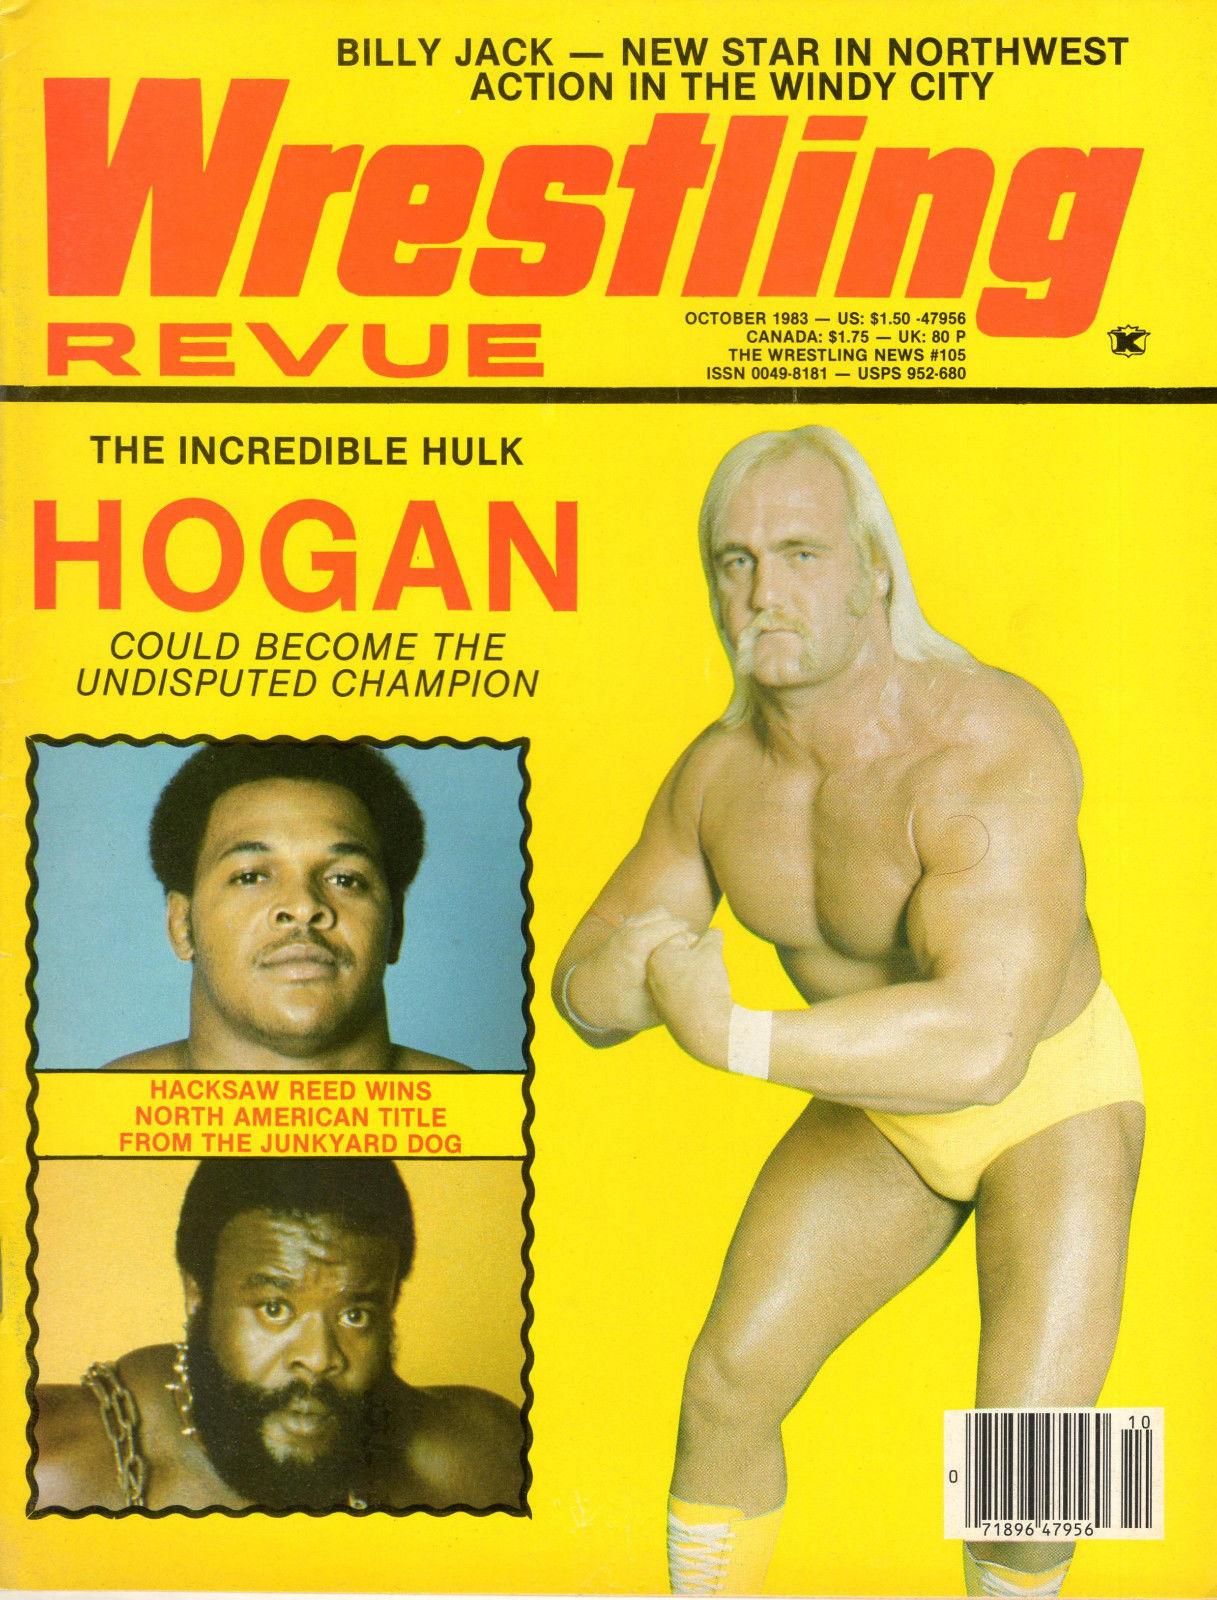 Wrestling Revue - October 1983